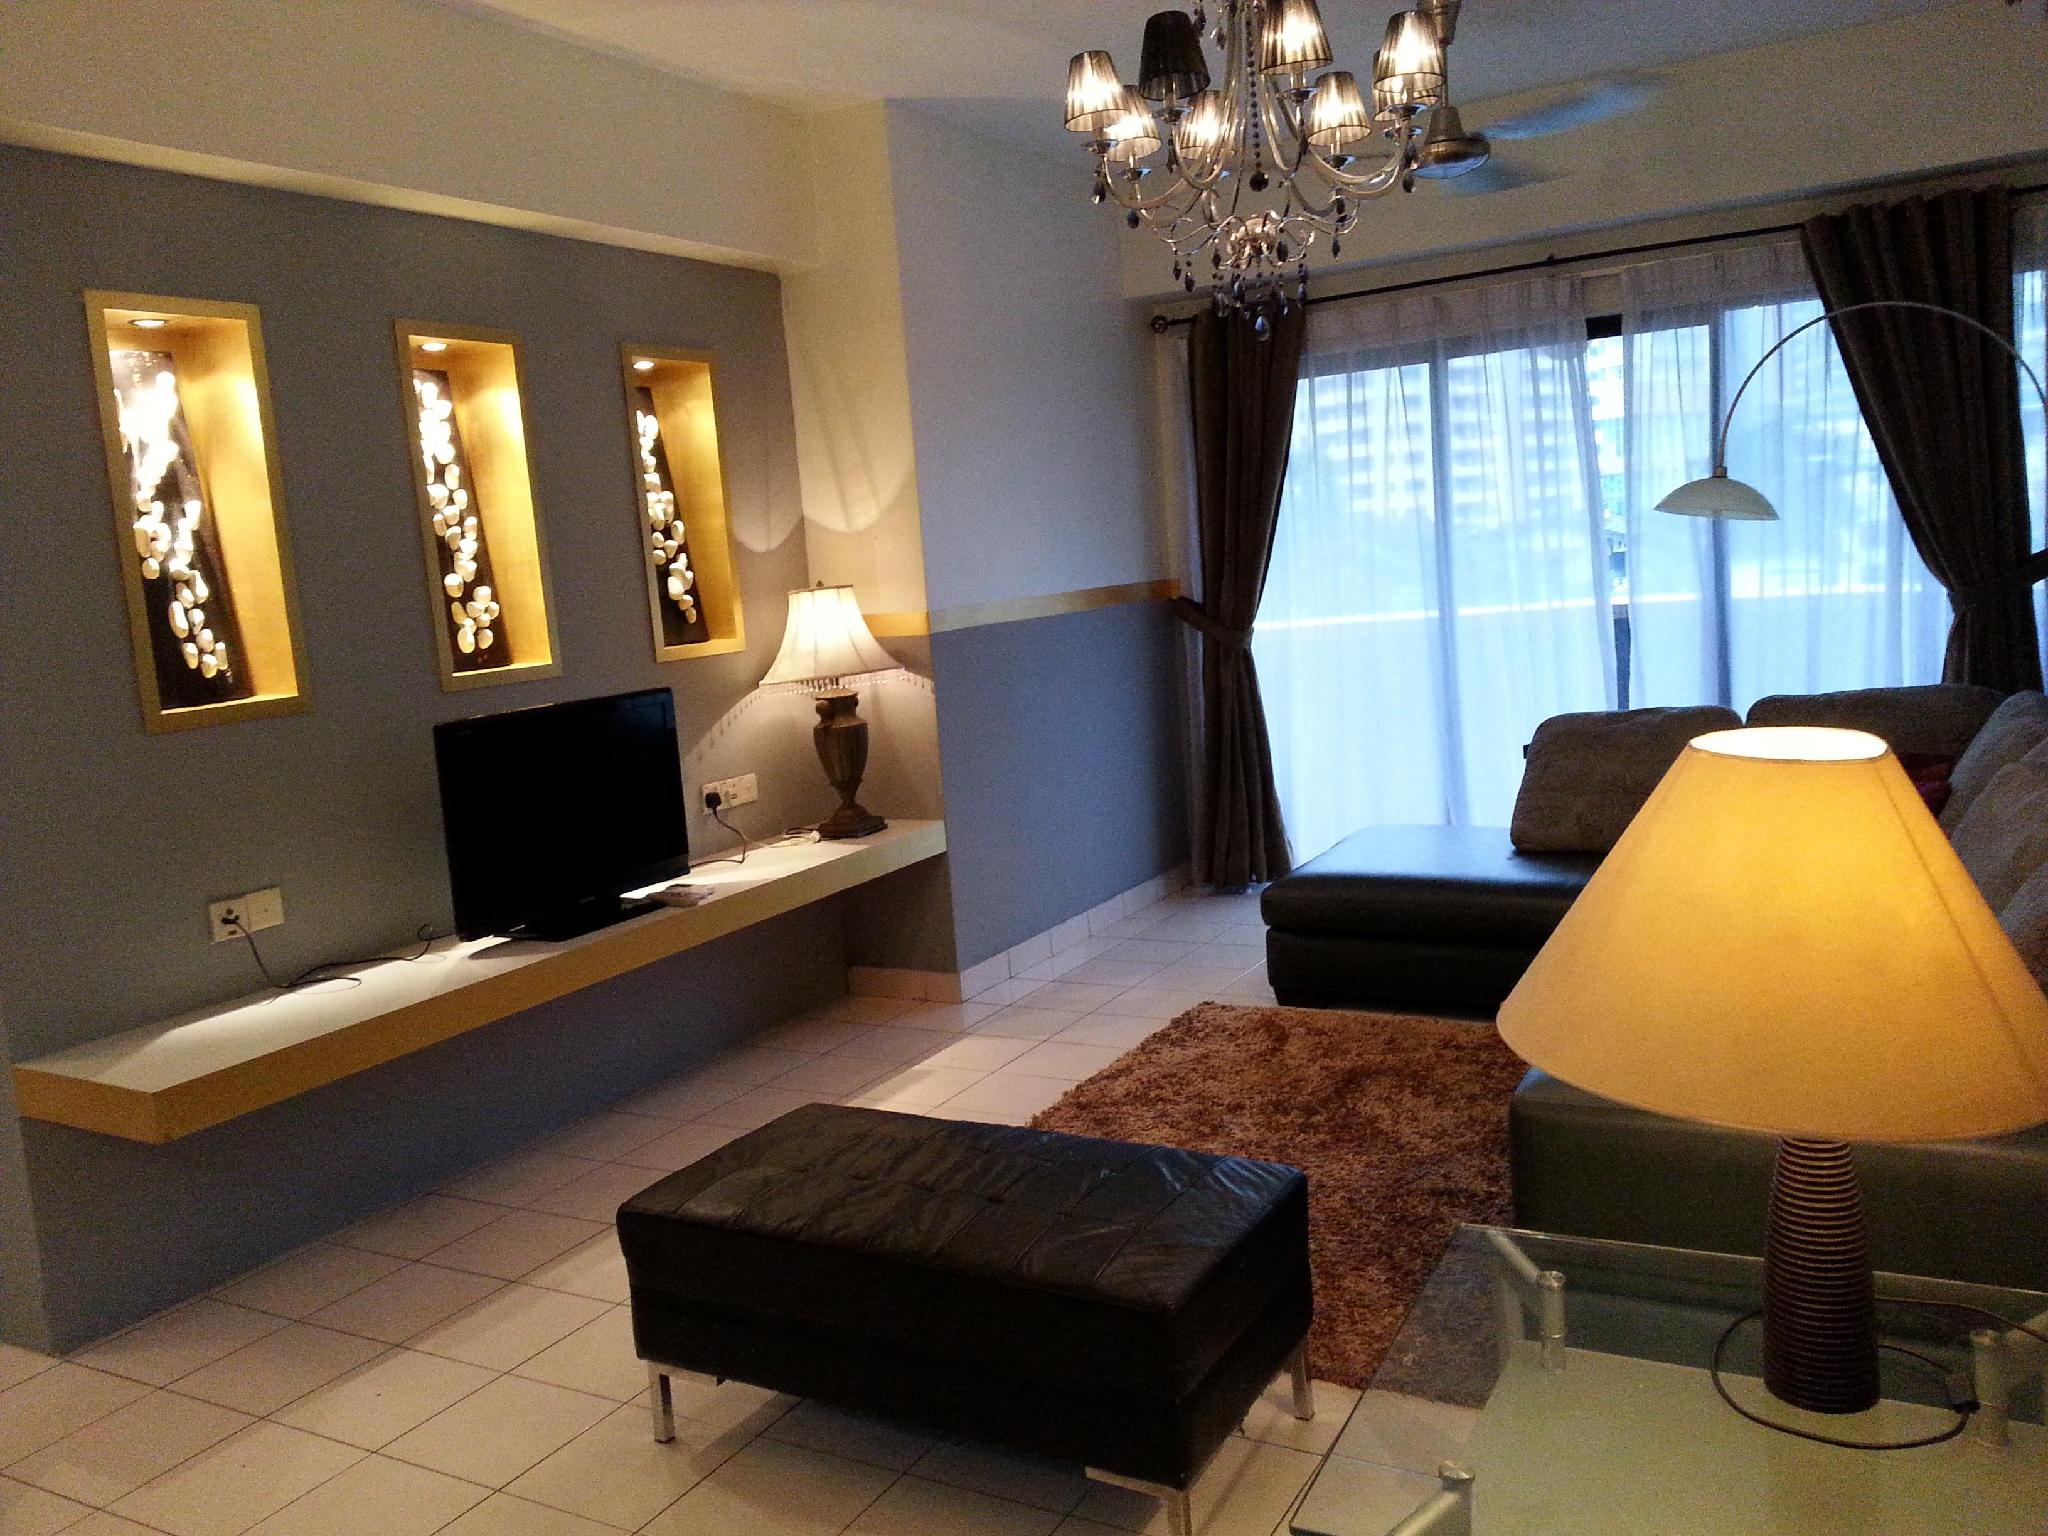 Harta8 Vacation Home @ Bukit Bintang - Hotels and Accommodation in Malaysia, Asia